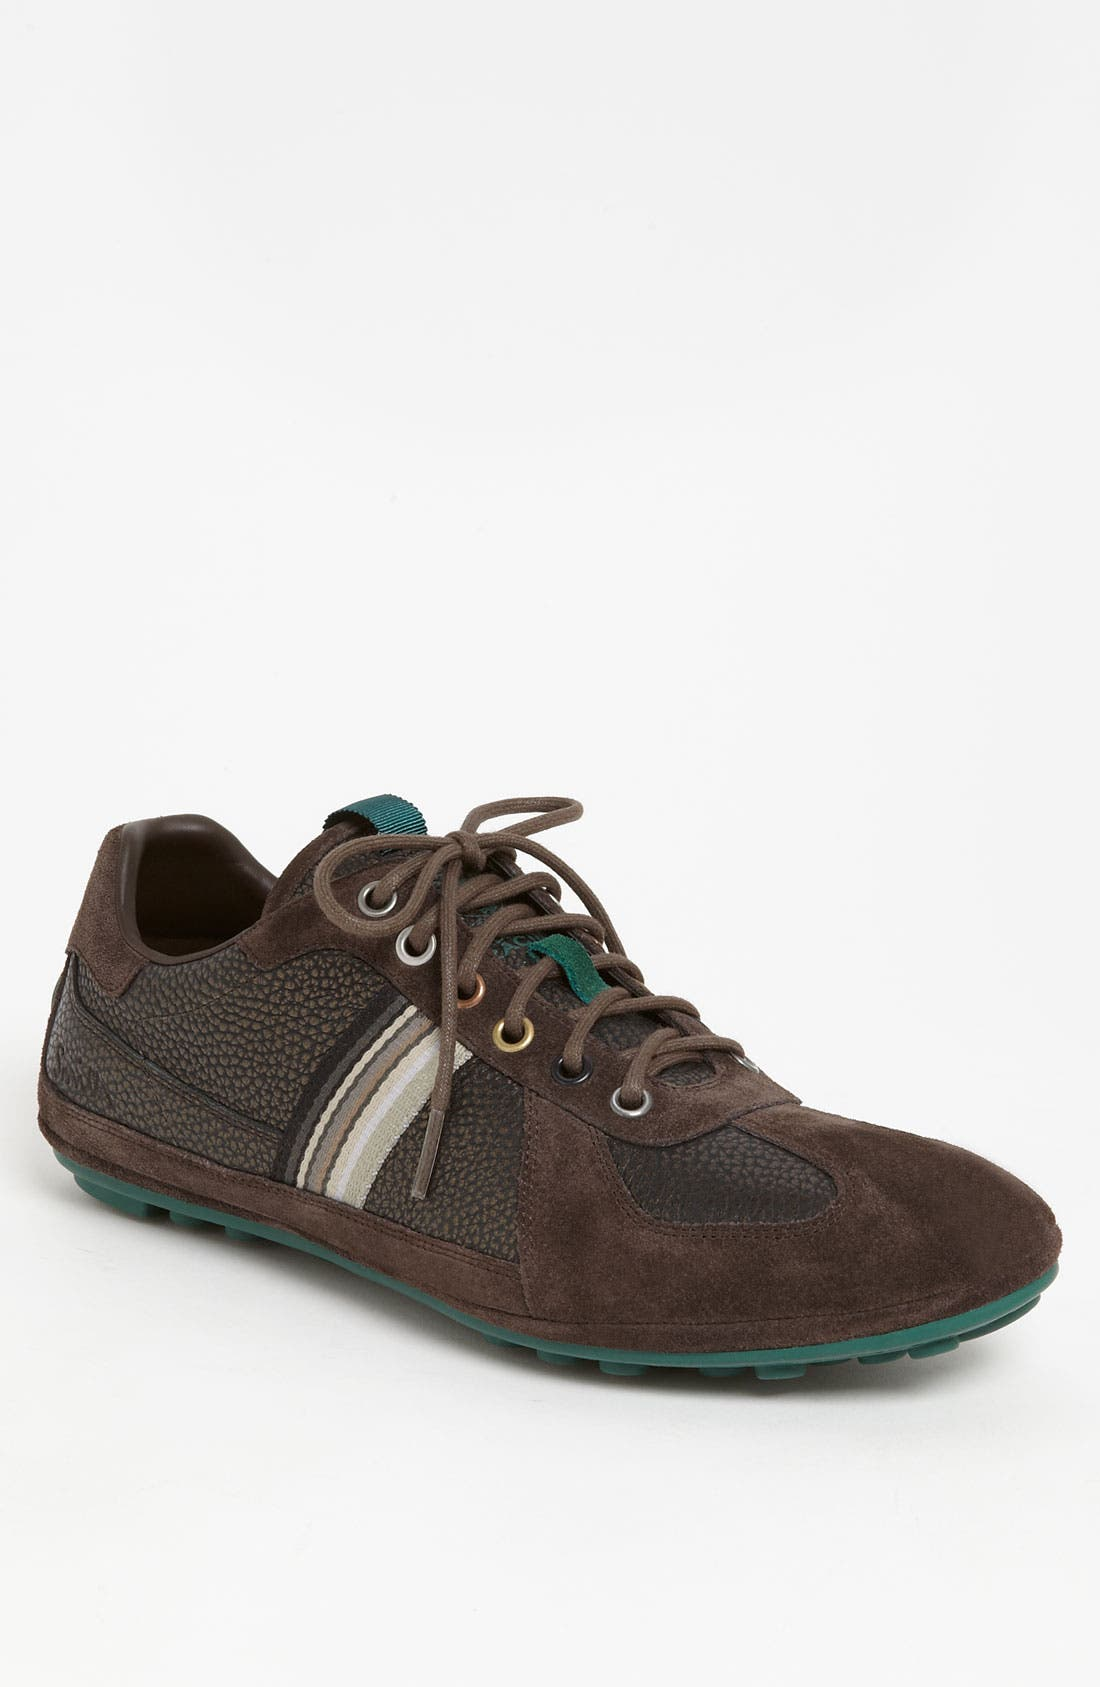 Alternate Image 1 Selected - Paul Smith 'Tago' Sneaker